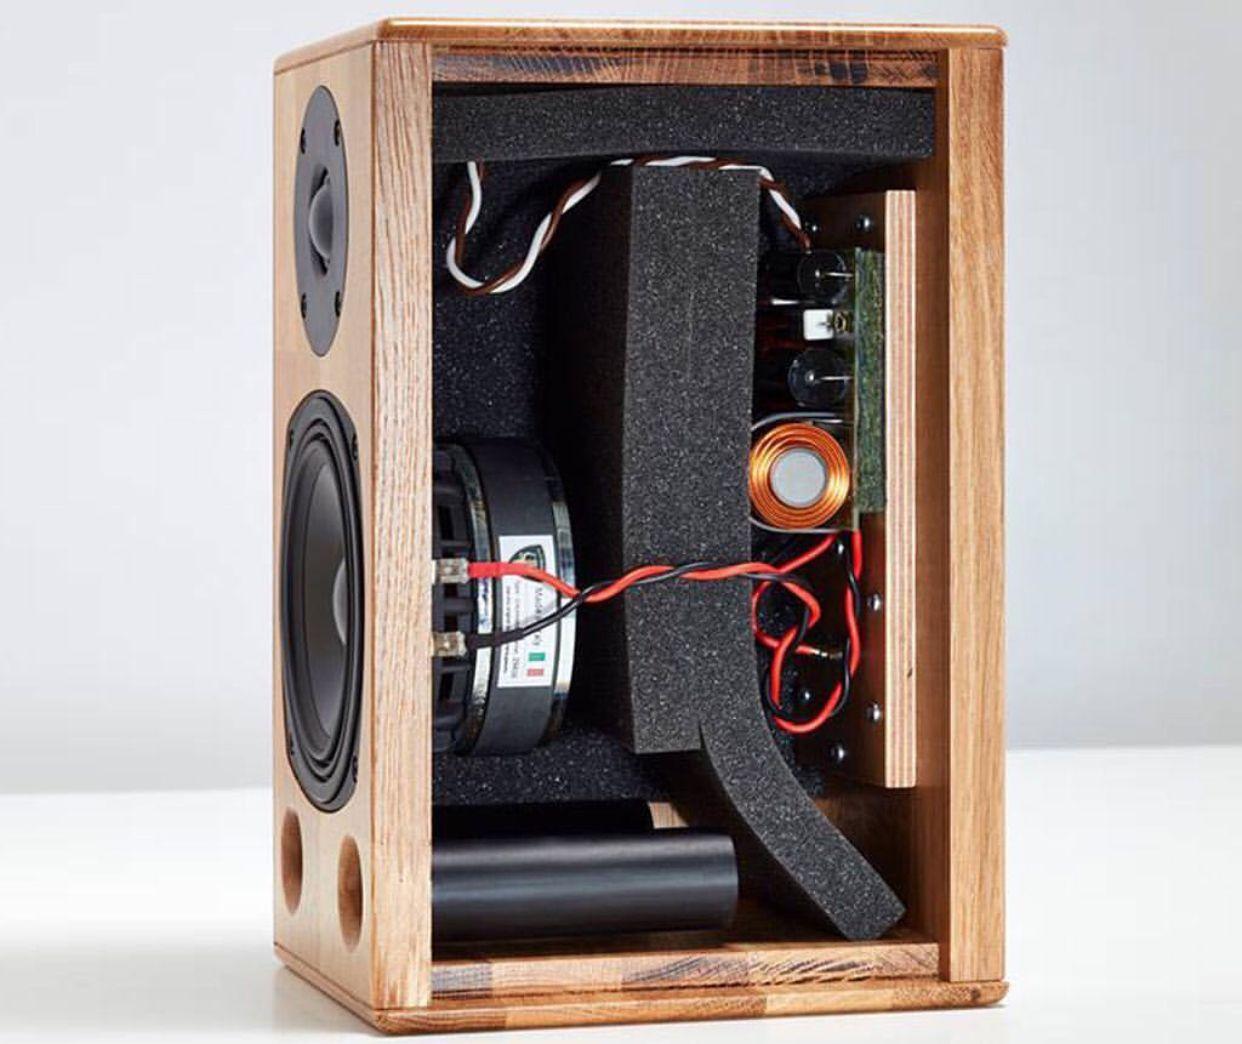 Pro Audio Speakers Diy Speakers Diy Amplifier Ham Radio Antenna Speaker Design Speaker System High E Speaker Box Design Subwoofer Box Design Diy Speakers